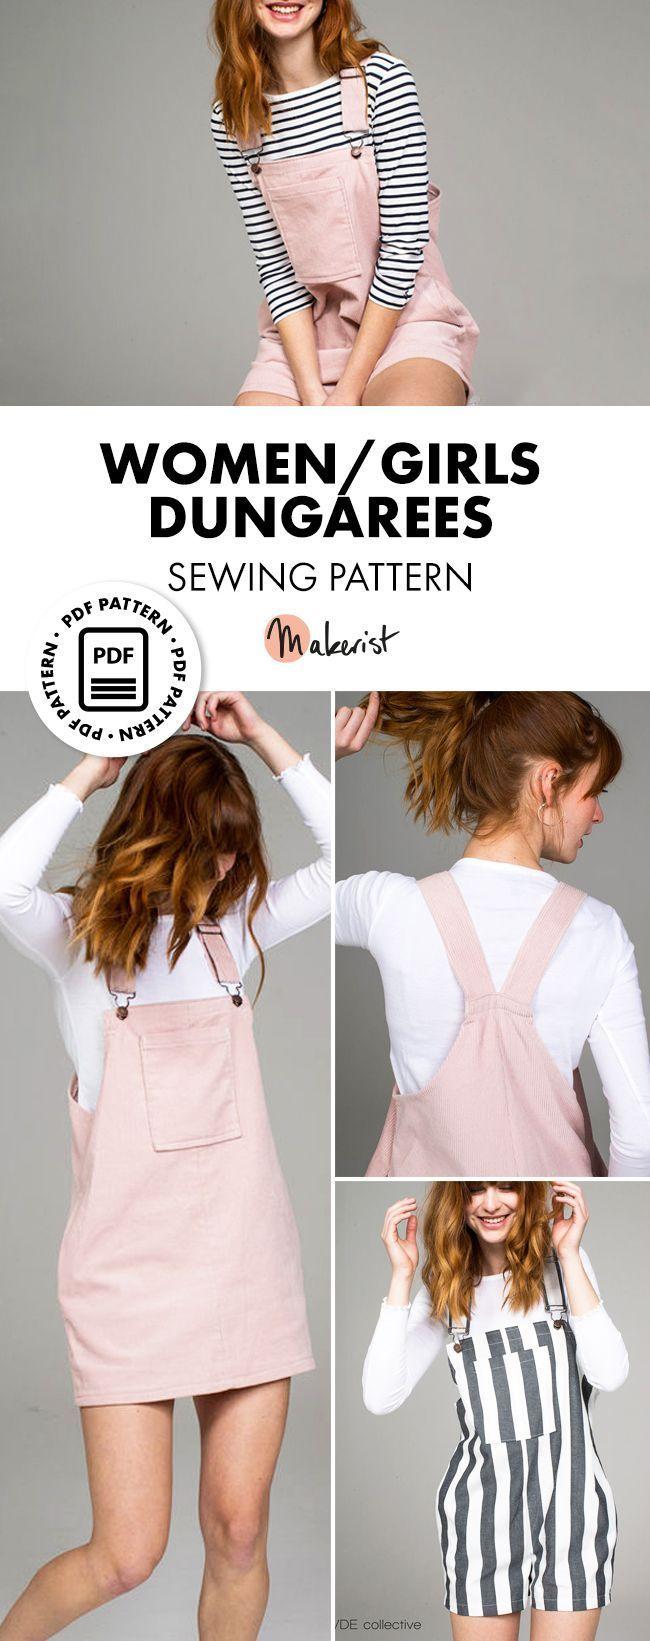 Women Dungarees & Pinafore dress sewing patterns